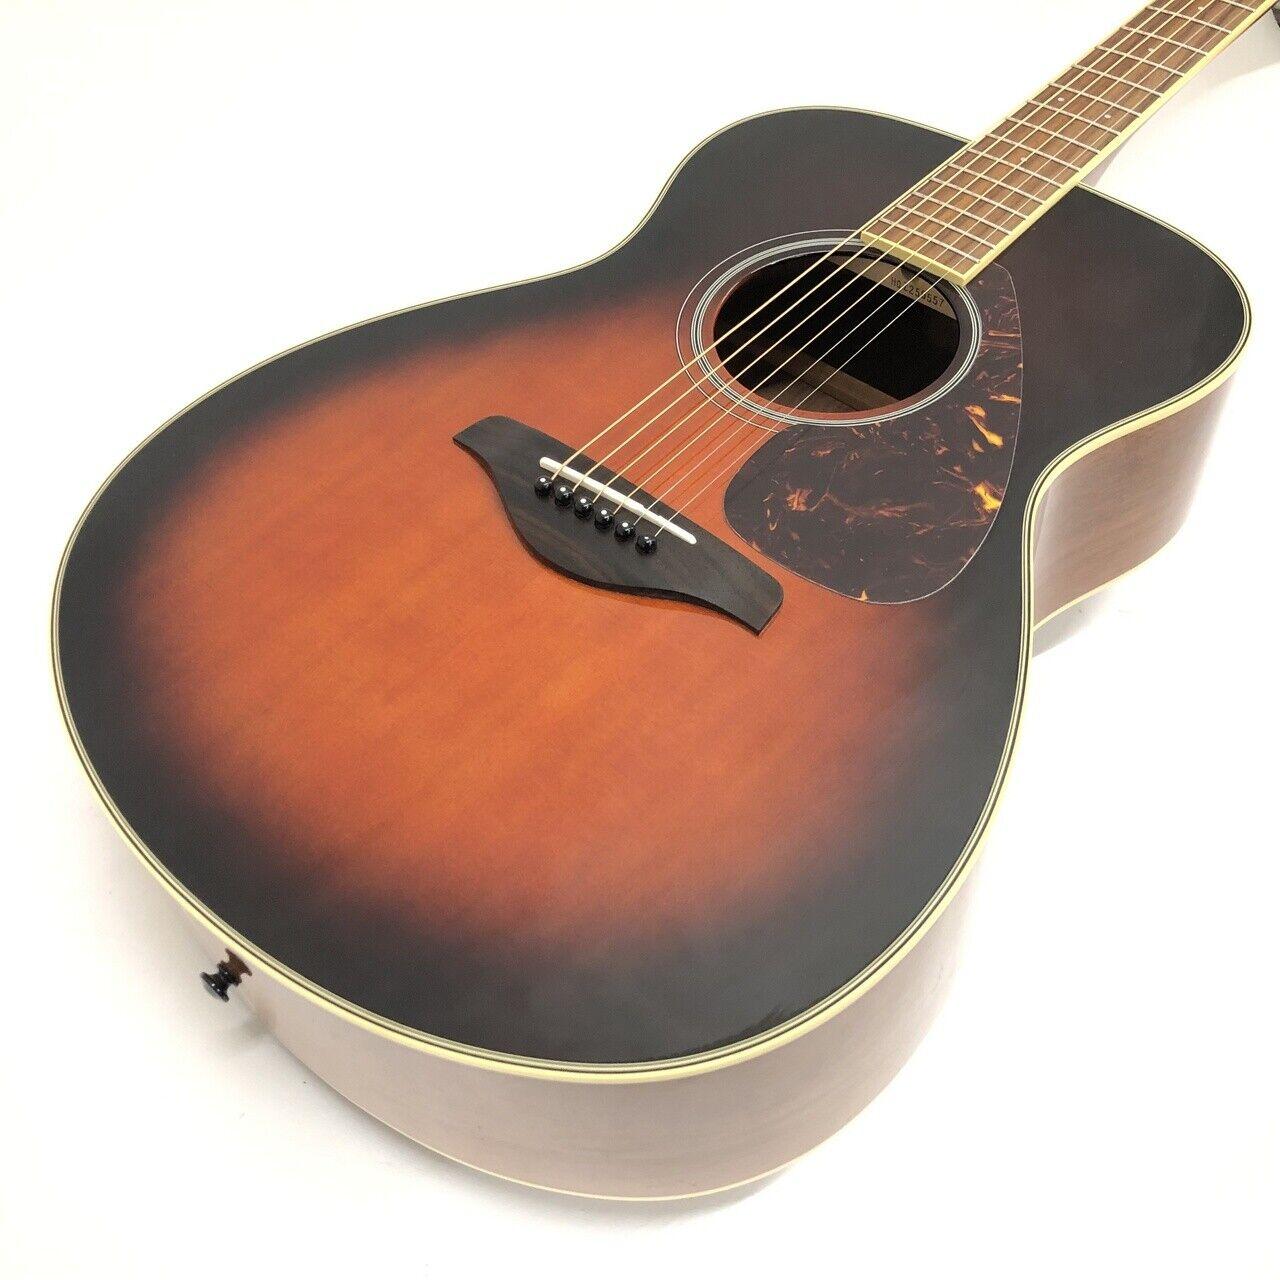 YAMAHA FS720S acoustic guitar Japan rare beautiful vintage popular EMS F   S